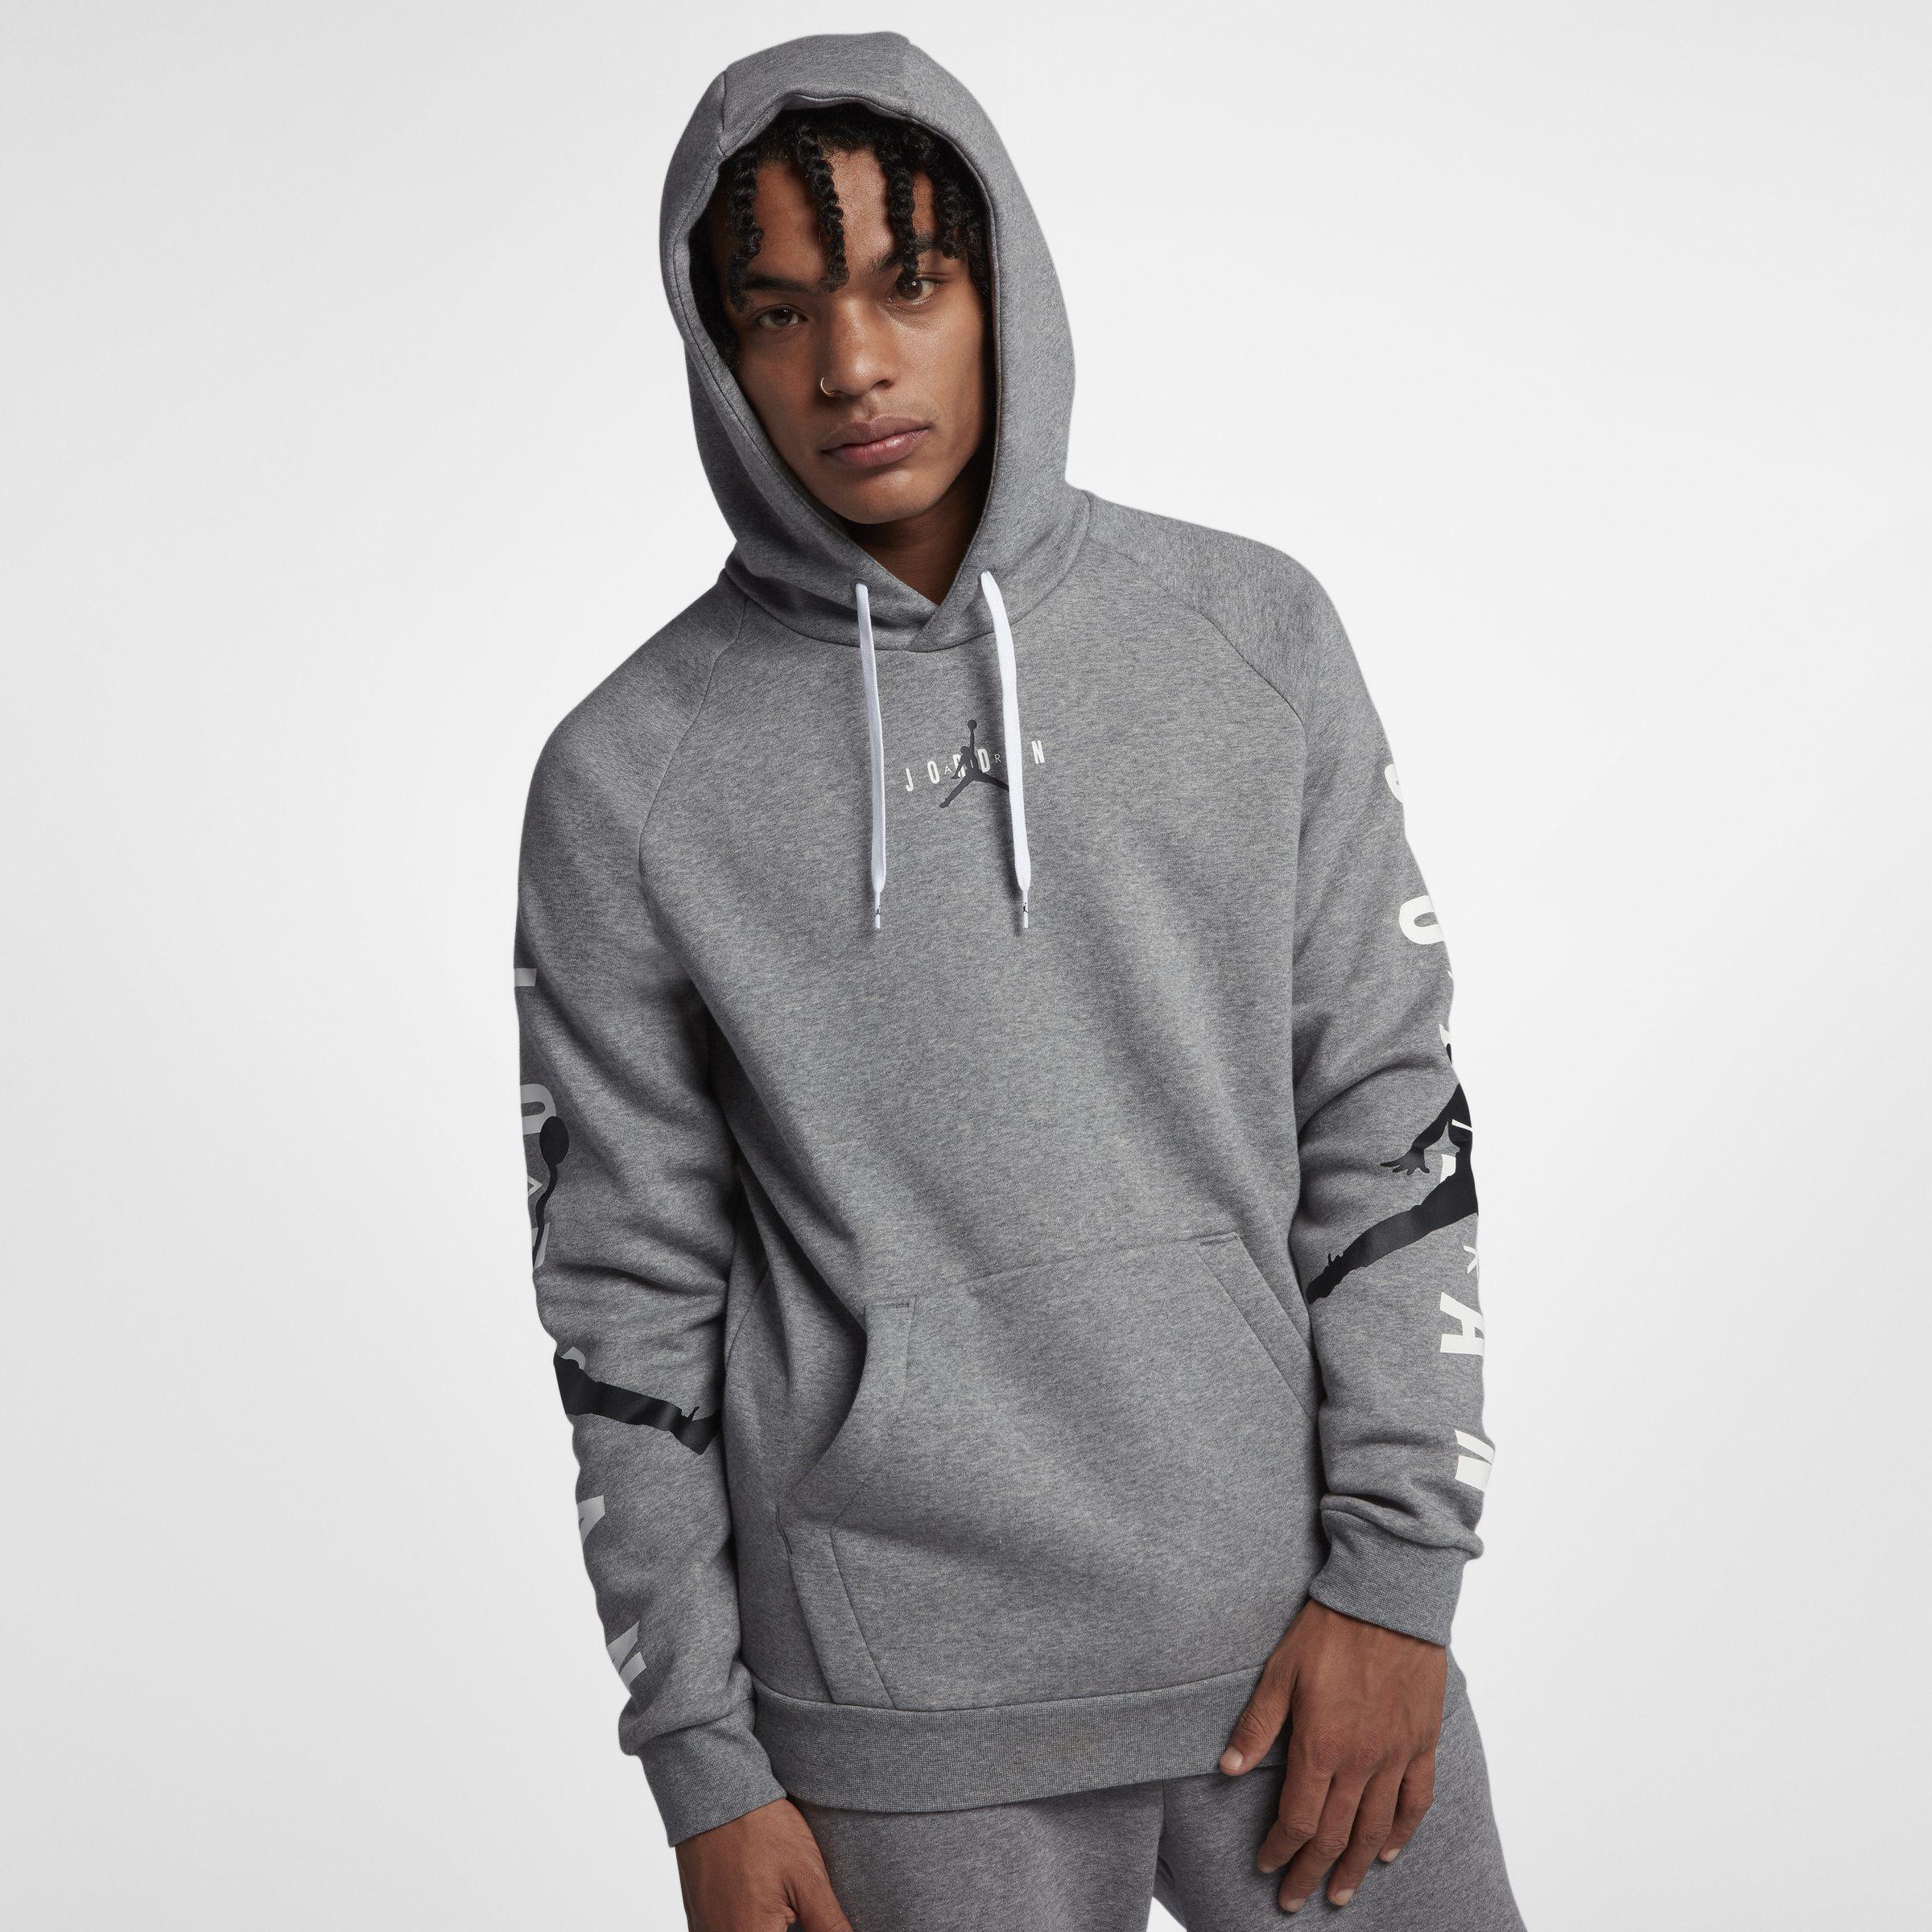 50a803c5643001 Nike Jordan Jumpman Air Pullover Hoodie in Gray for Men - Lyst